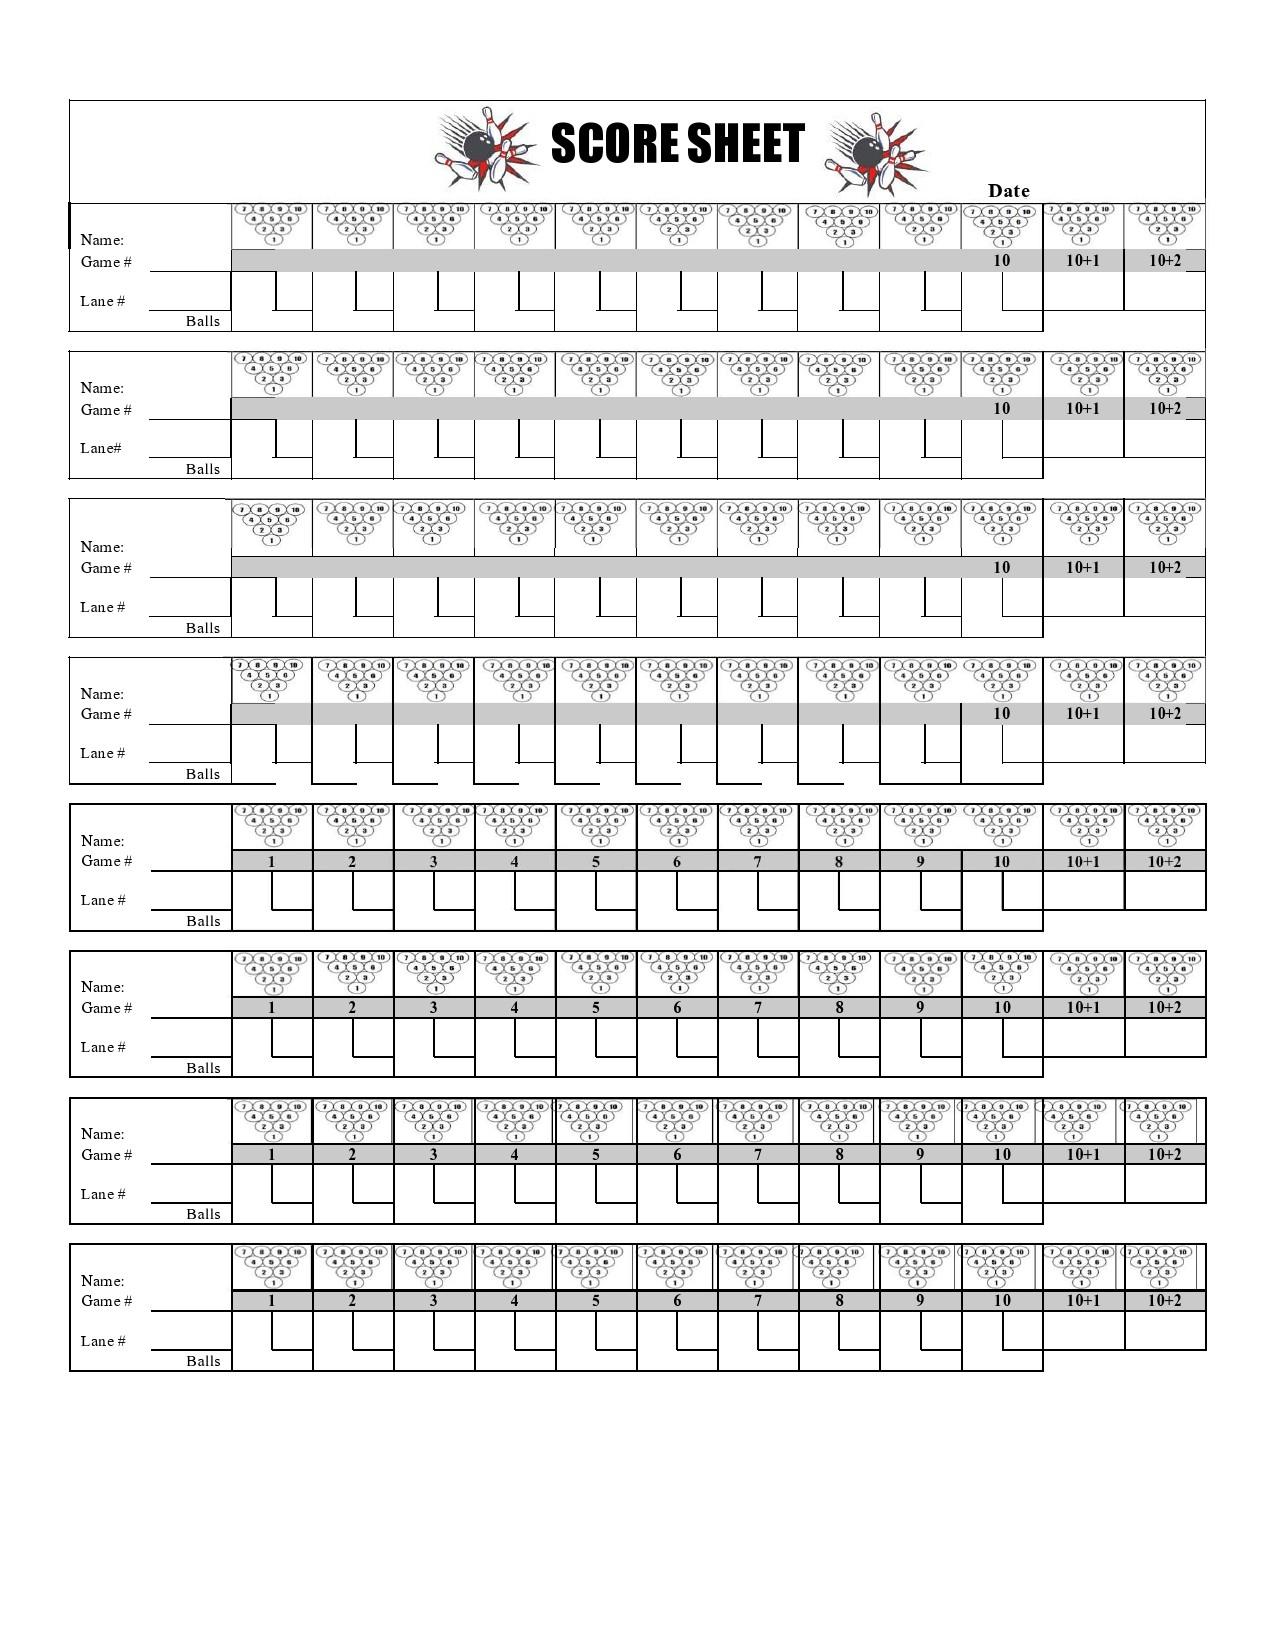 Free bowling score sheet 28